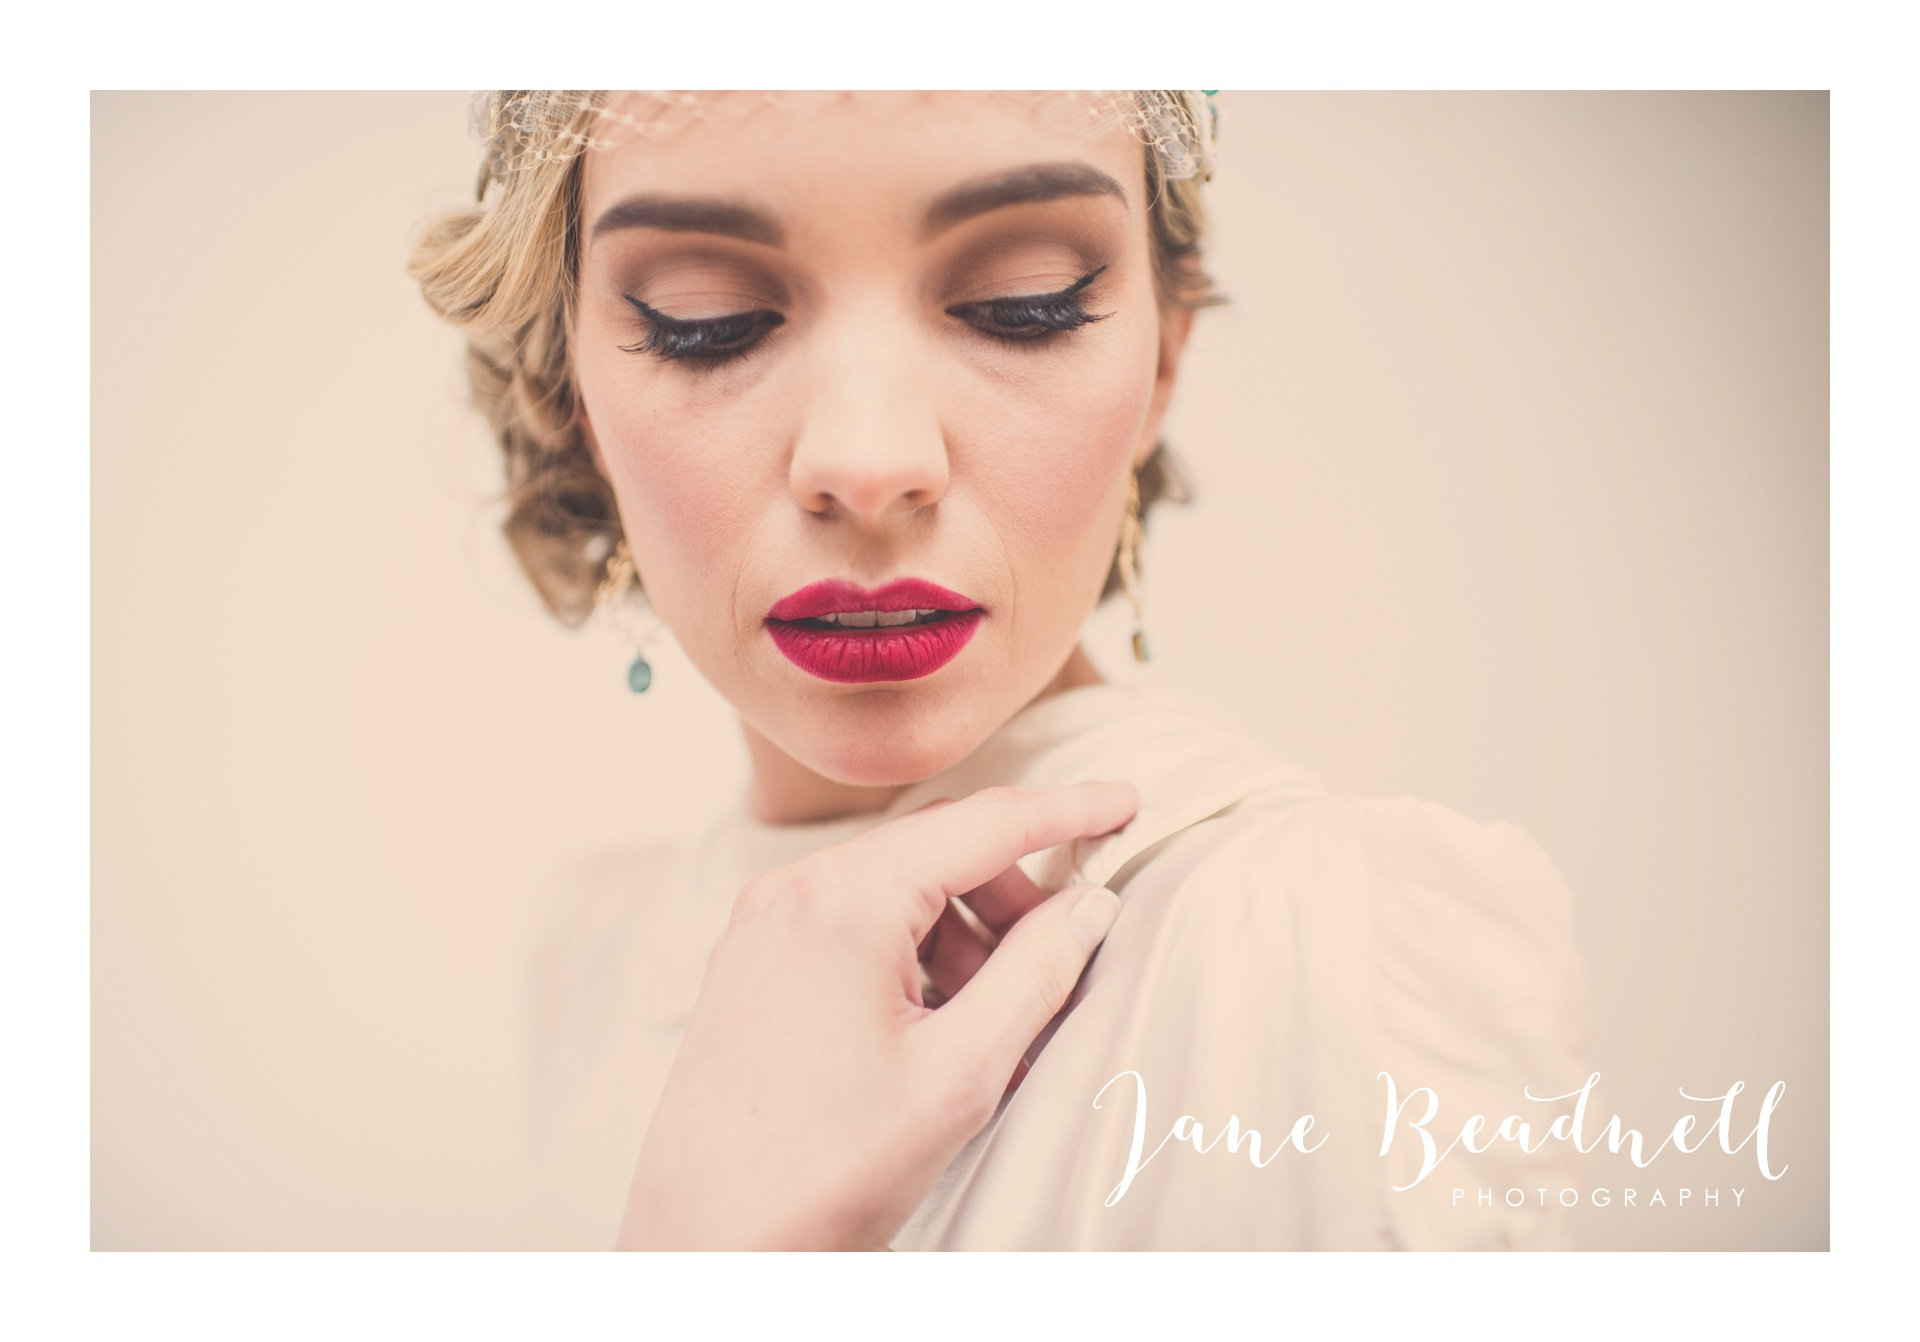 fine-art-wedding-photographer-jane-beadnell-photography_0052